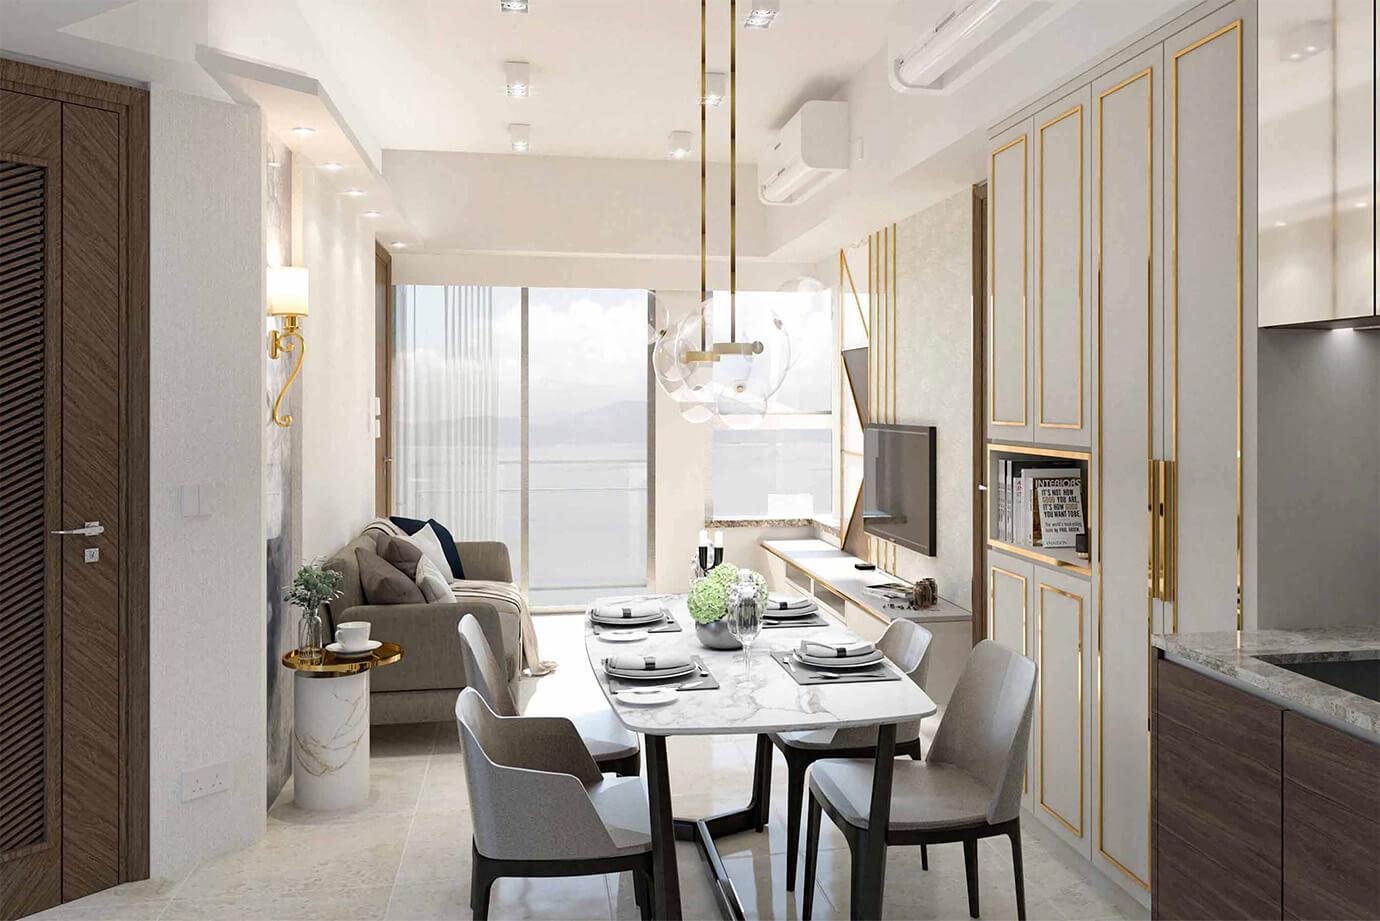 Inch Interior Design Hong Kong Ocean Supreme